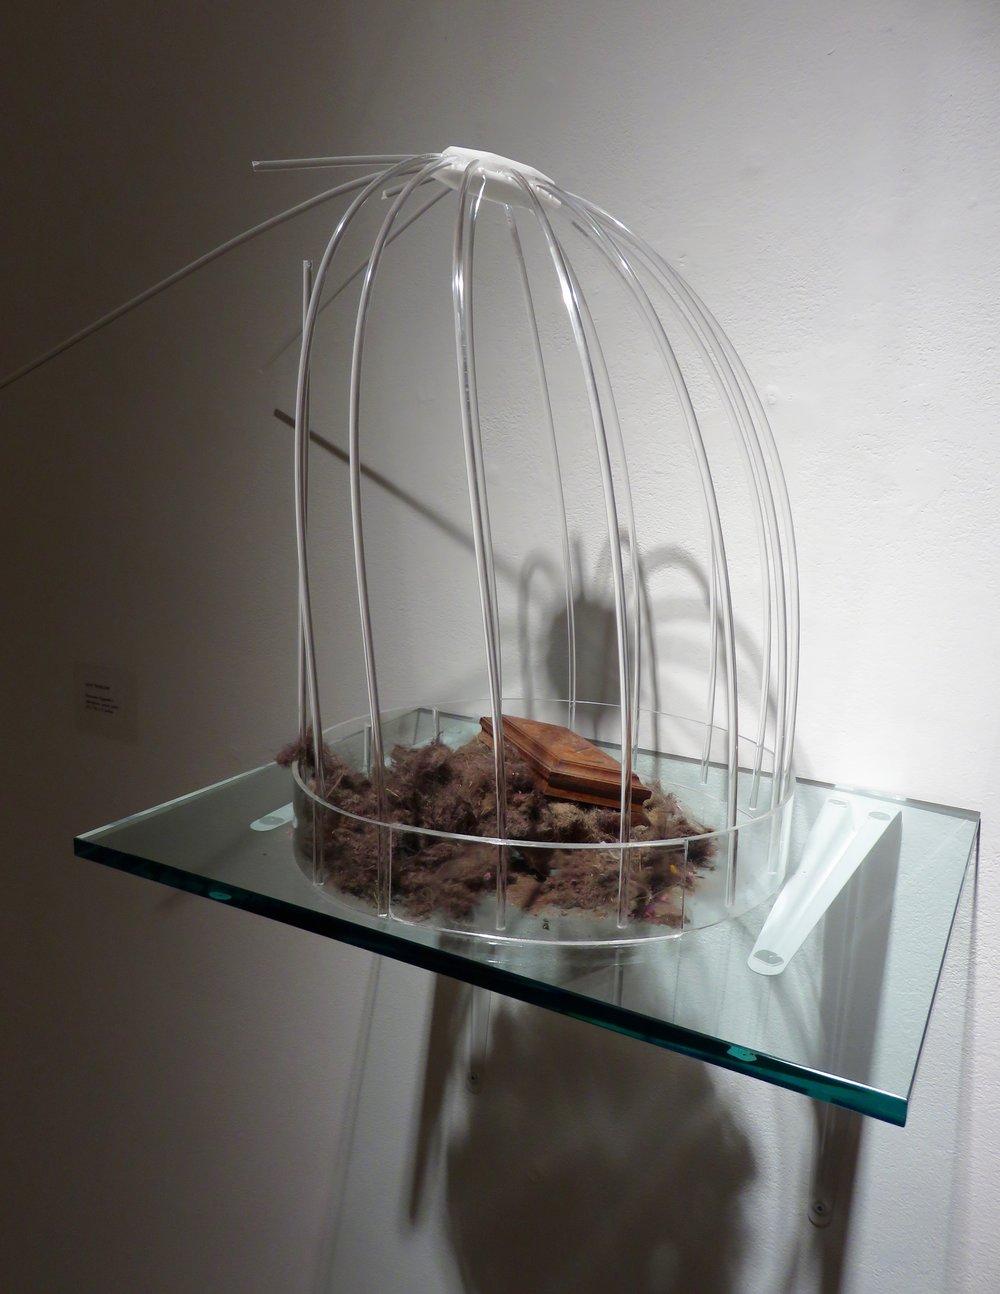 Domestic Vignette I,  2016 Plexiglass, wood,Roomba dirt 22 x 16 x 11 inches